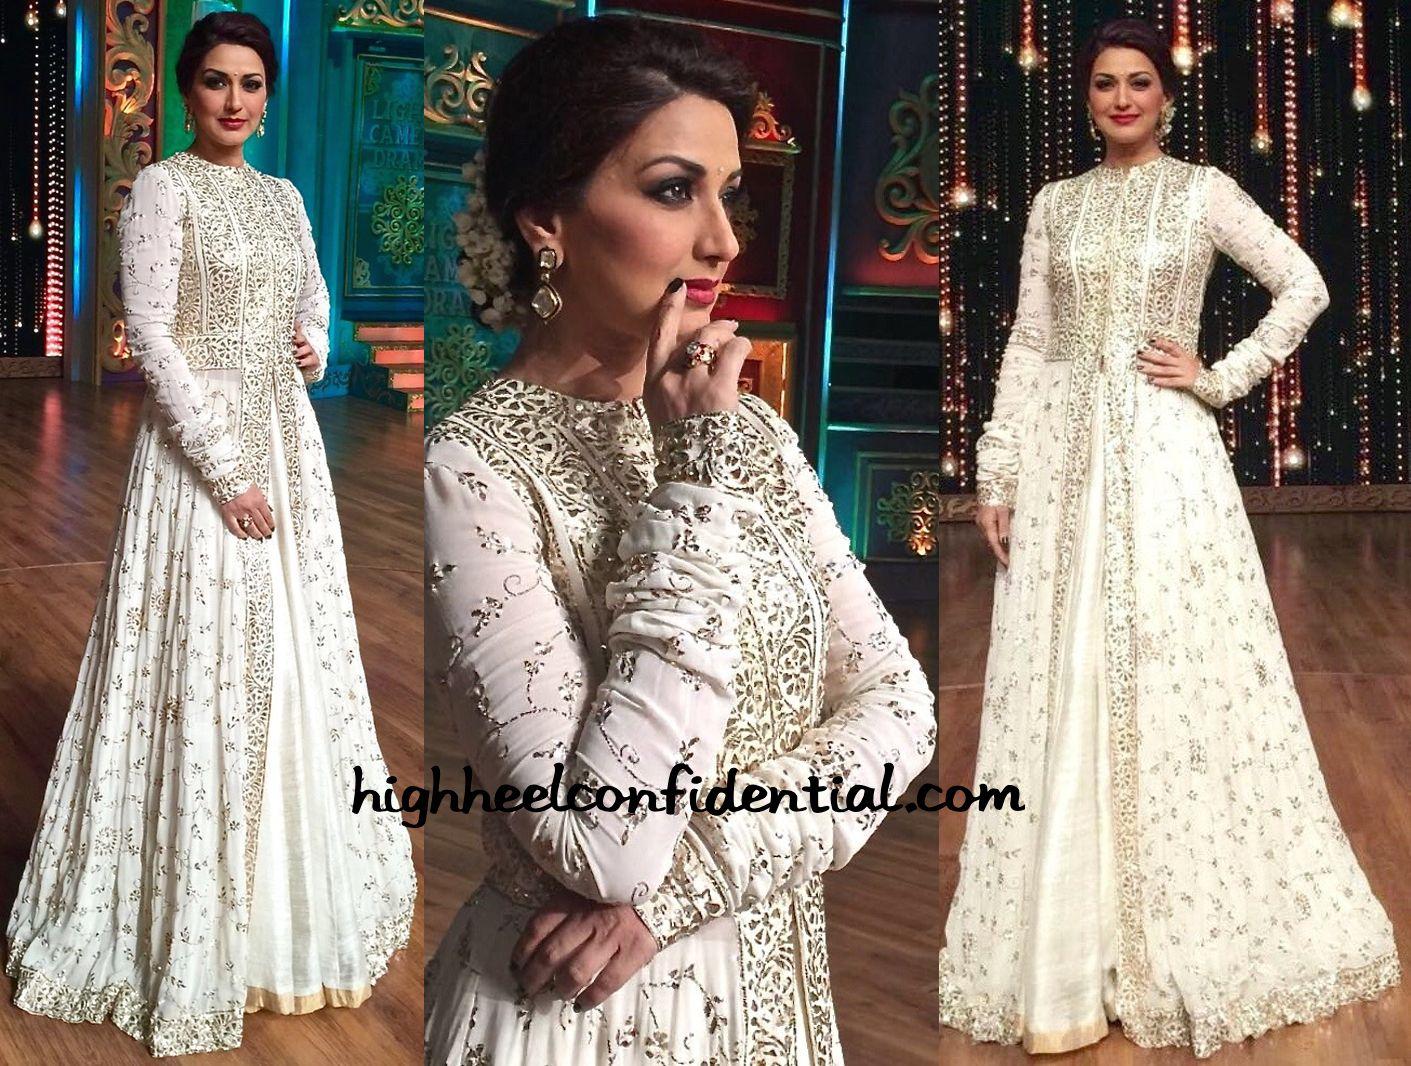 Image result for manish malhotra | Indian Clothes | Pinterest